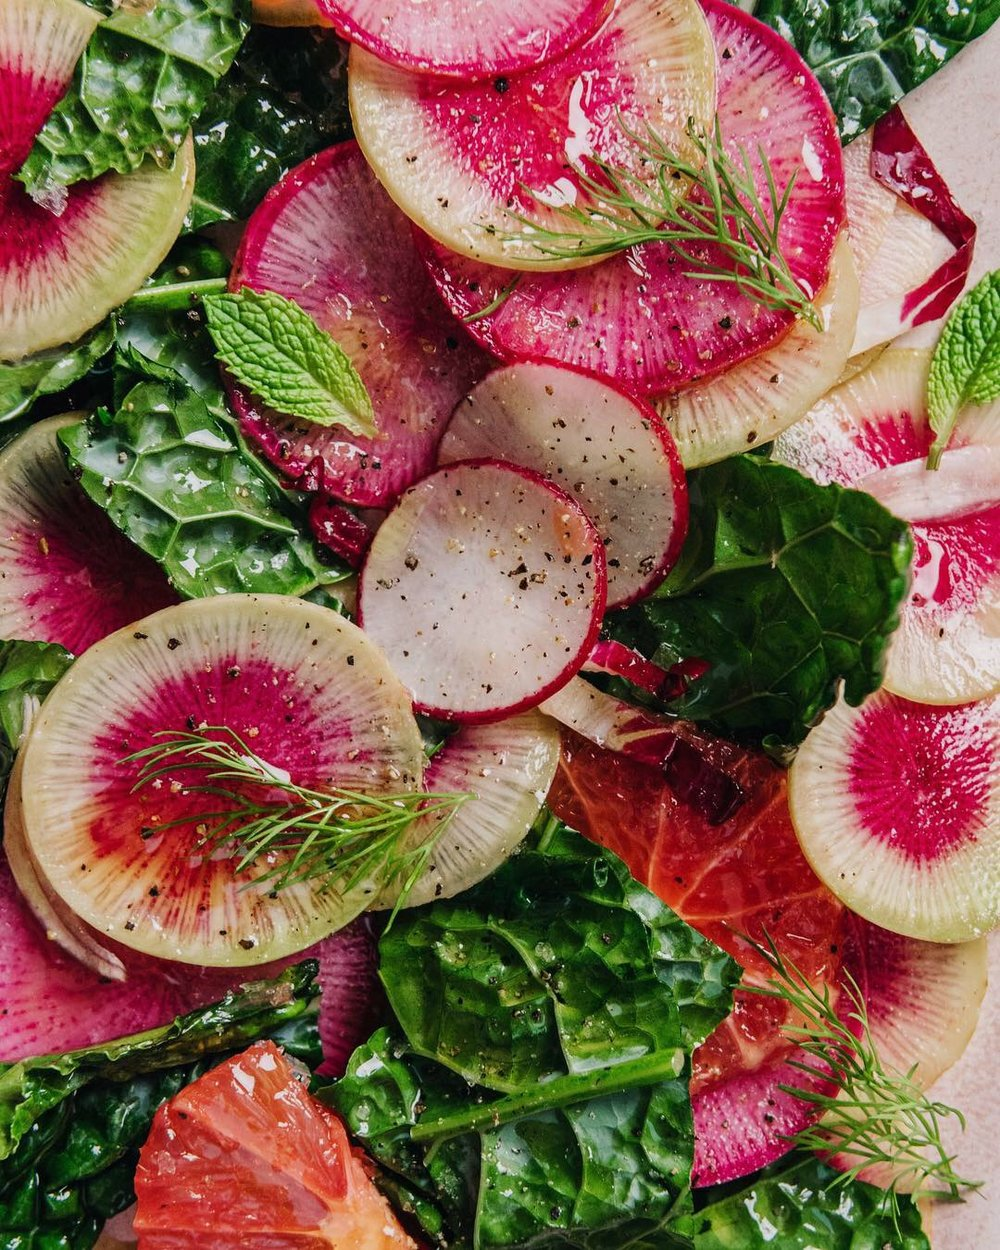 WINTER RADISH AND KALE SALAD WITH CITRUS AND HERBS #recipe #easyrecipe #wintersalads #watermelonradish #foodstyling #sarahcopeland #edibleliving